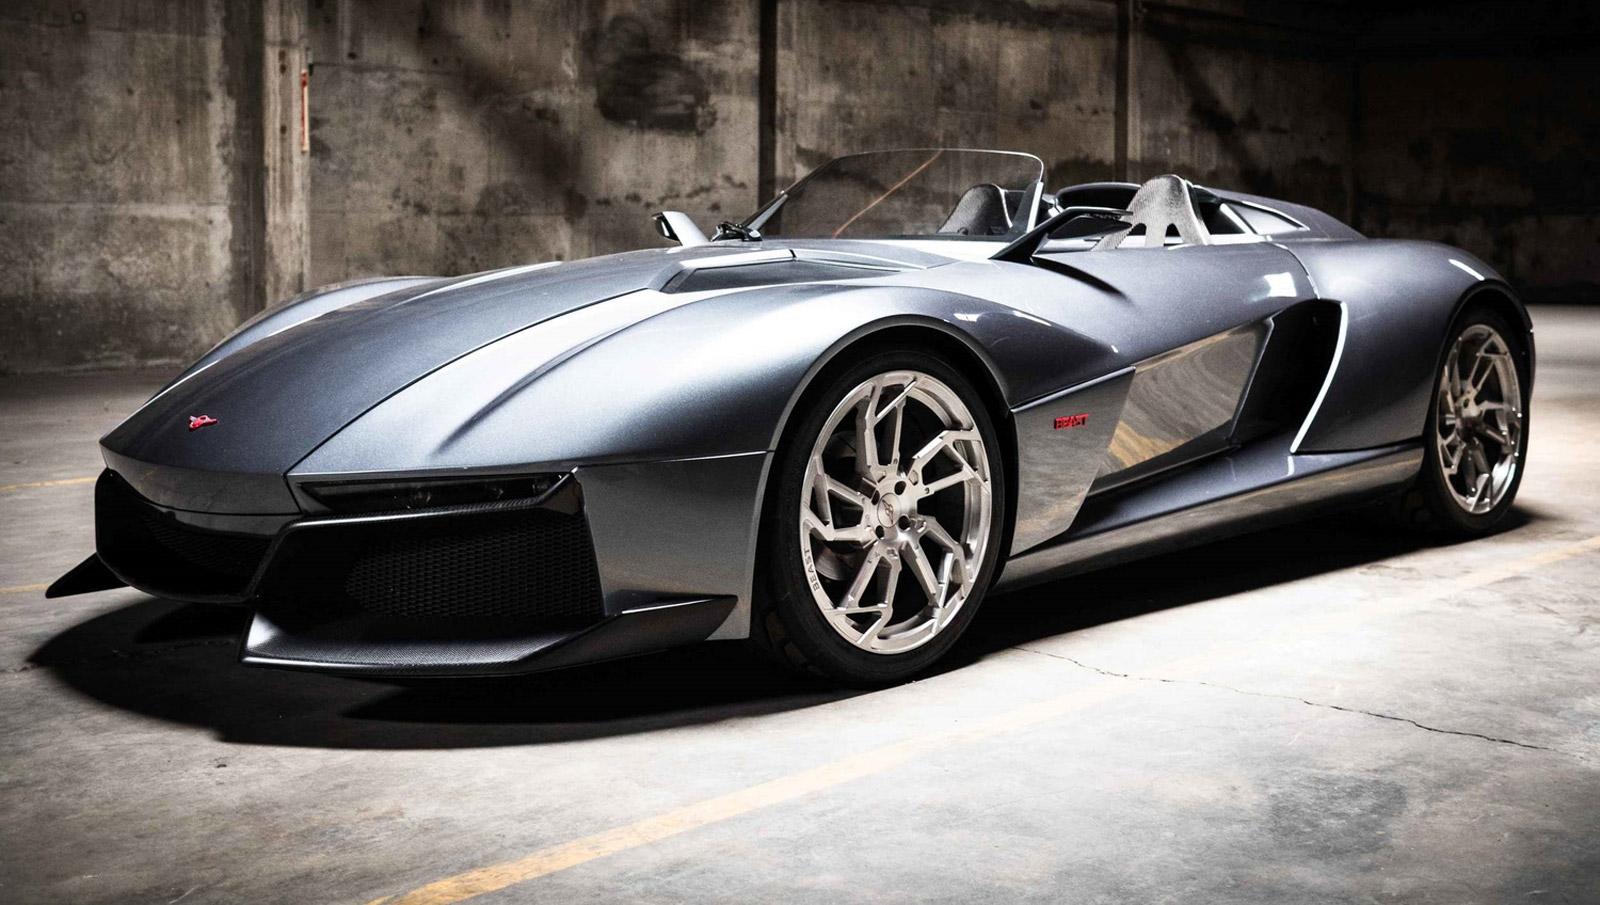 Rezvani Beast H on 500 Cadillac Engine Horsepower